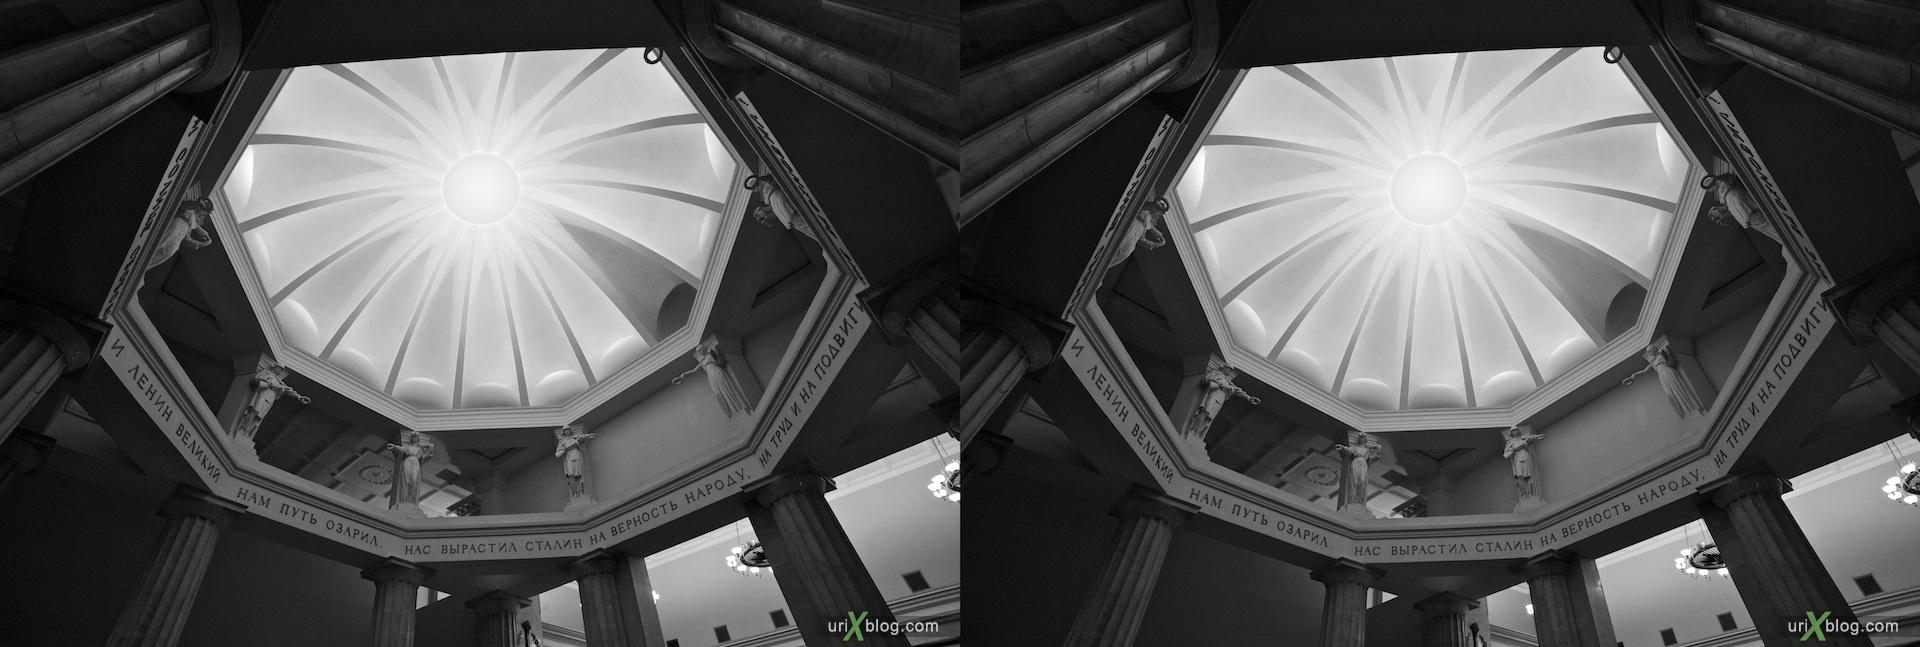 2011 stereo стерео вестибюль станции метро Курская, 3D, Москва